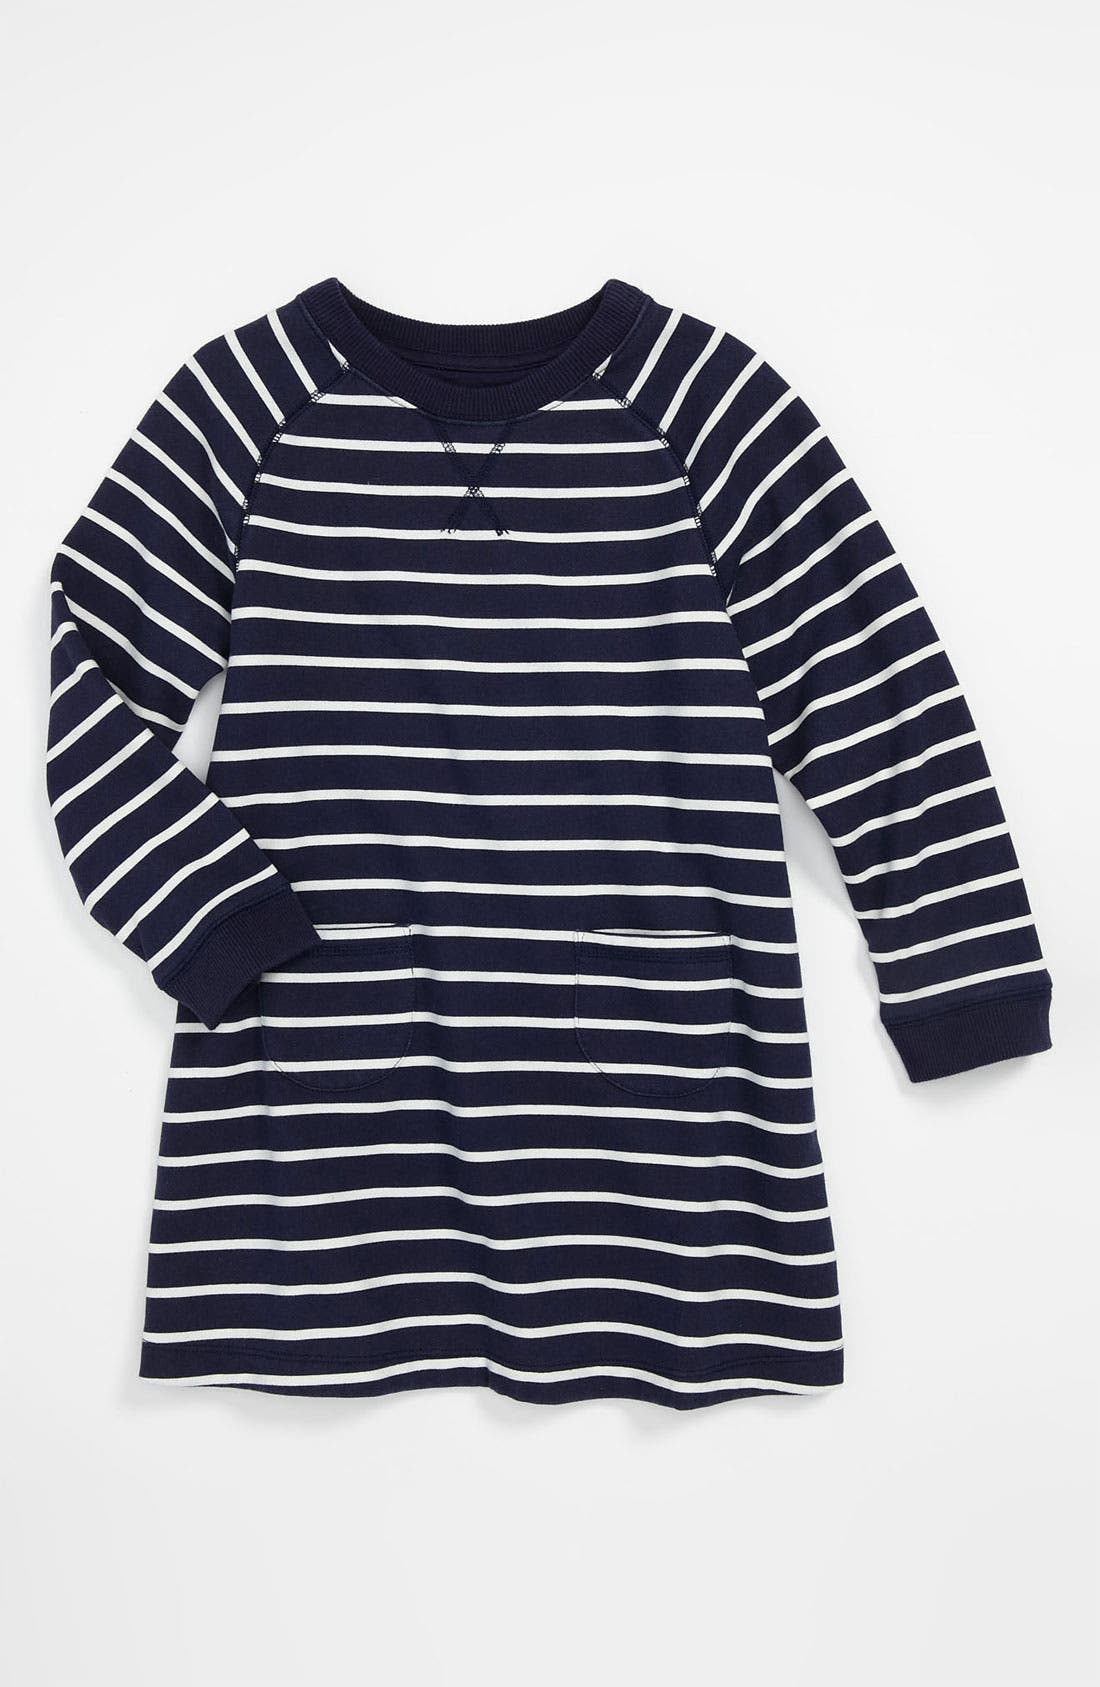 Main Image - Mini Boden 'Cozy' Sweatshirt Dress (Little Girls & Big Girls)